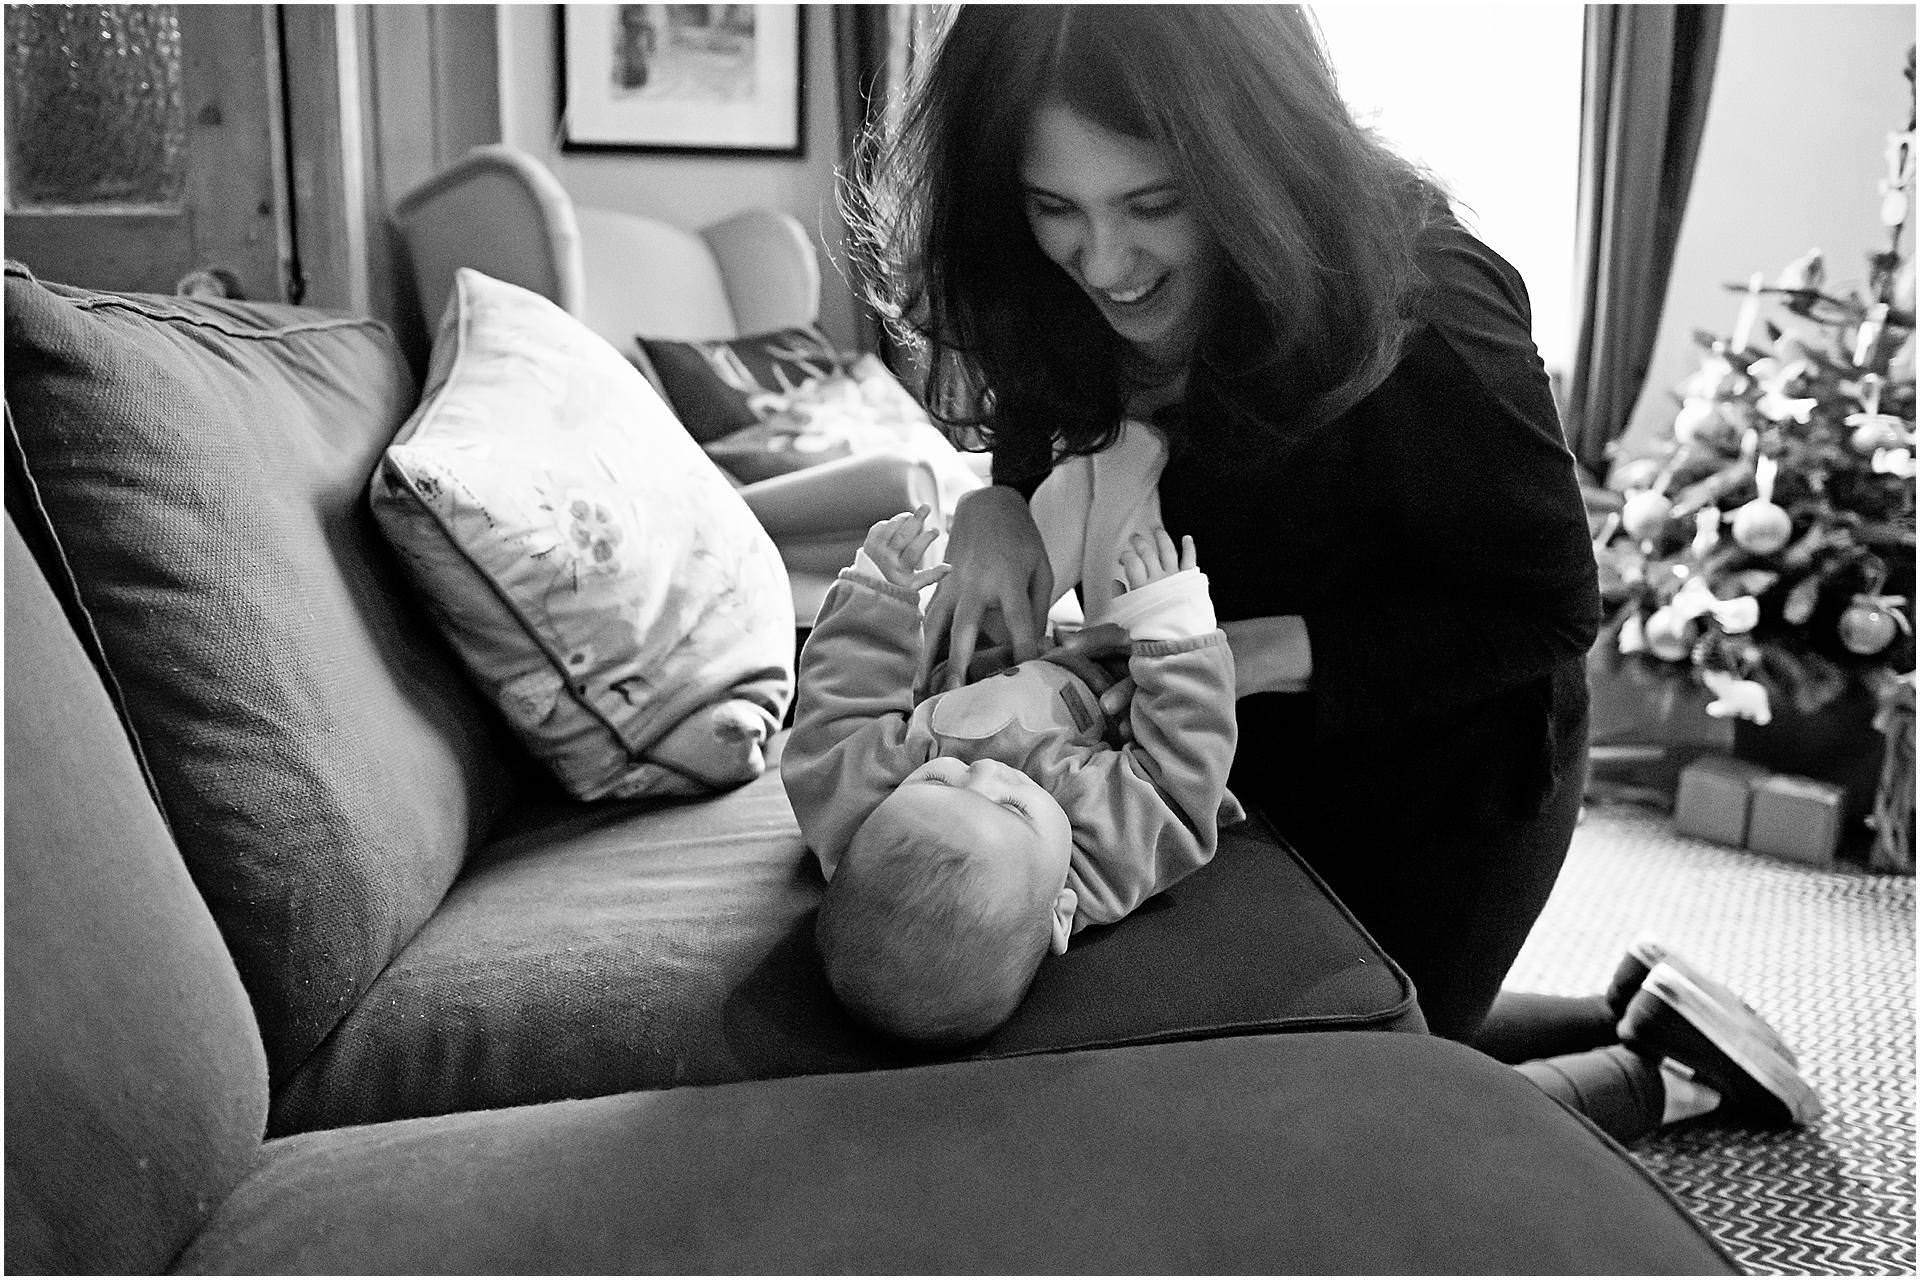 Newborn_photography with Sarah_bee_photography lifestyle_photography family_photography natural_photography photography_in_your_own_home baby_and_child_photography_1947.jpg